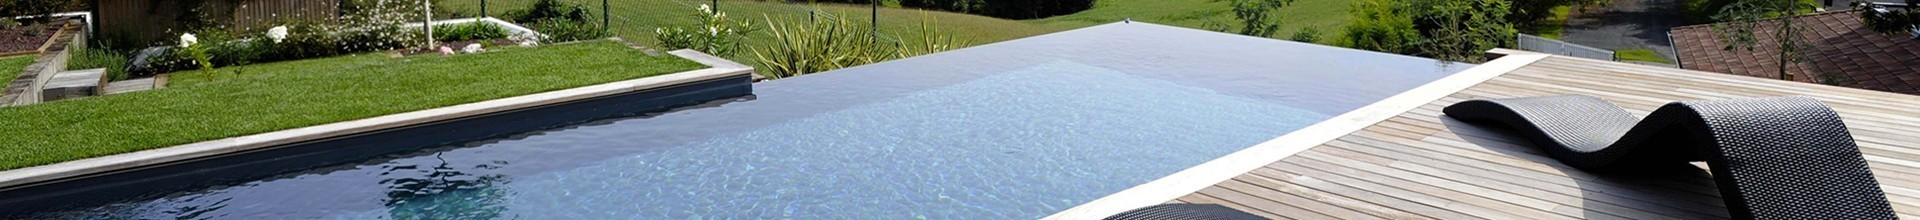 Direct usine, piscine coque prix Lugano